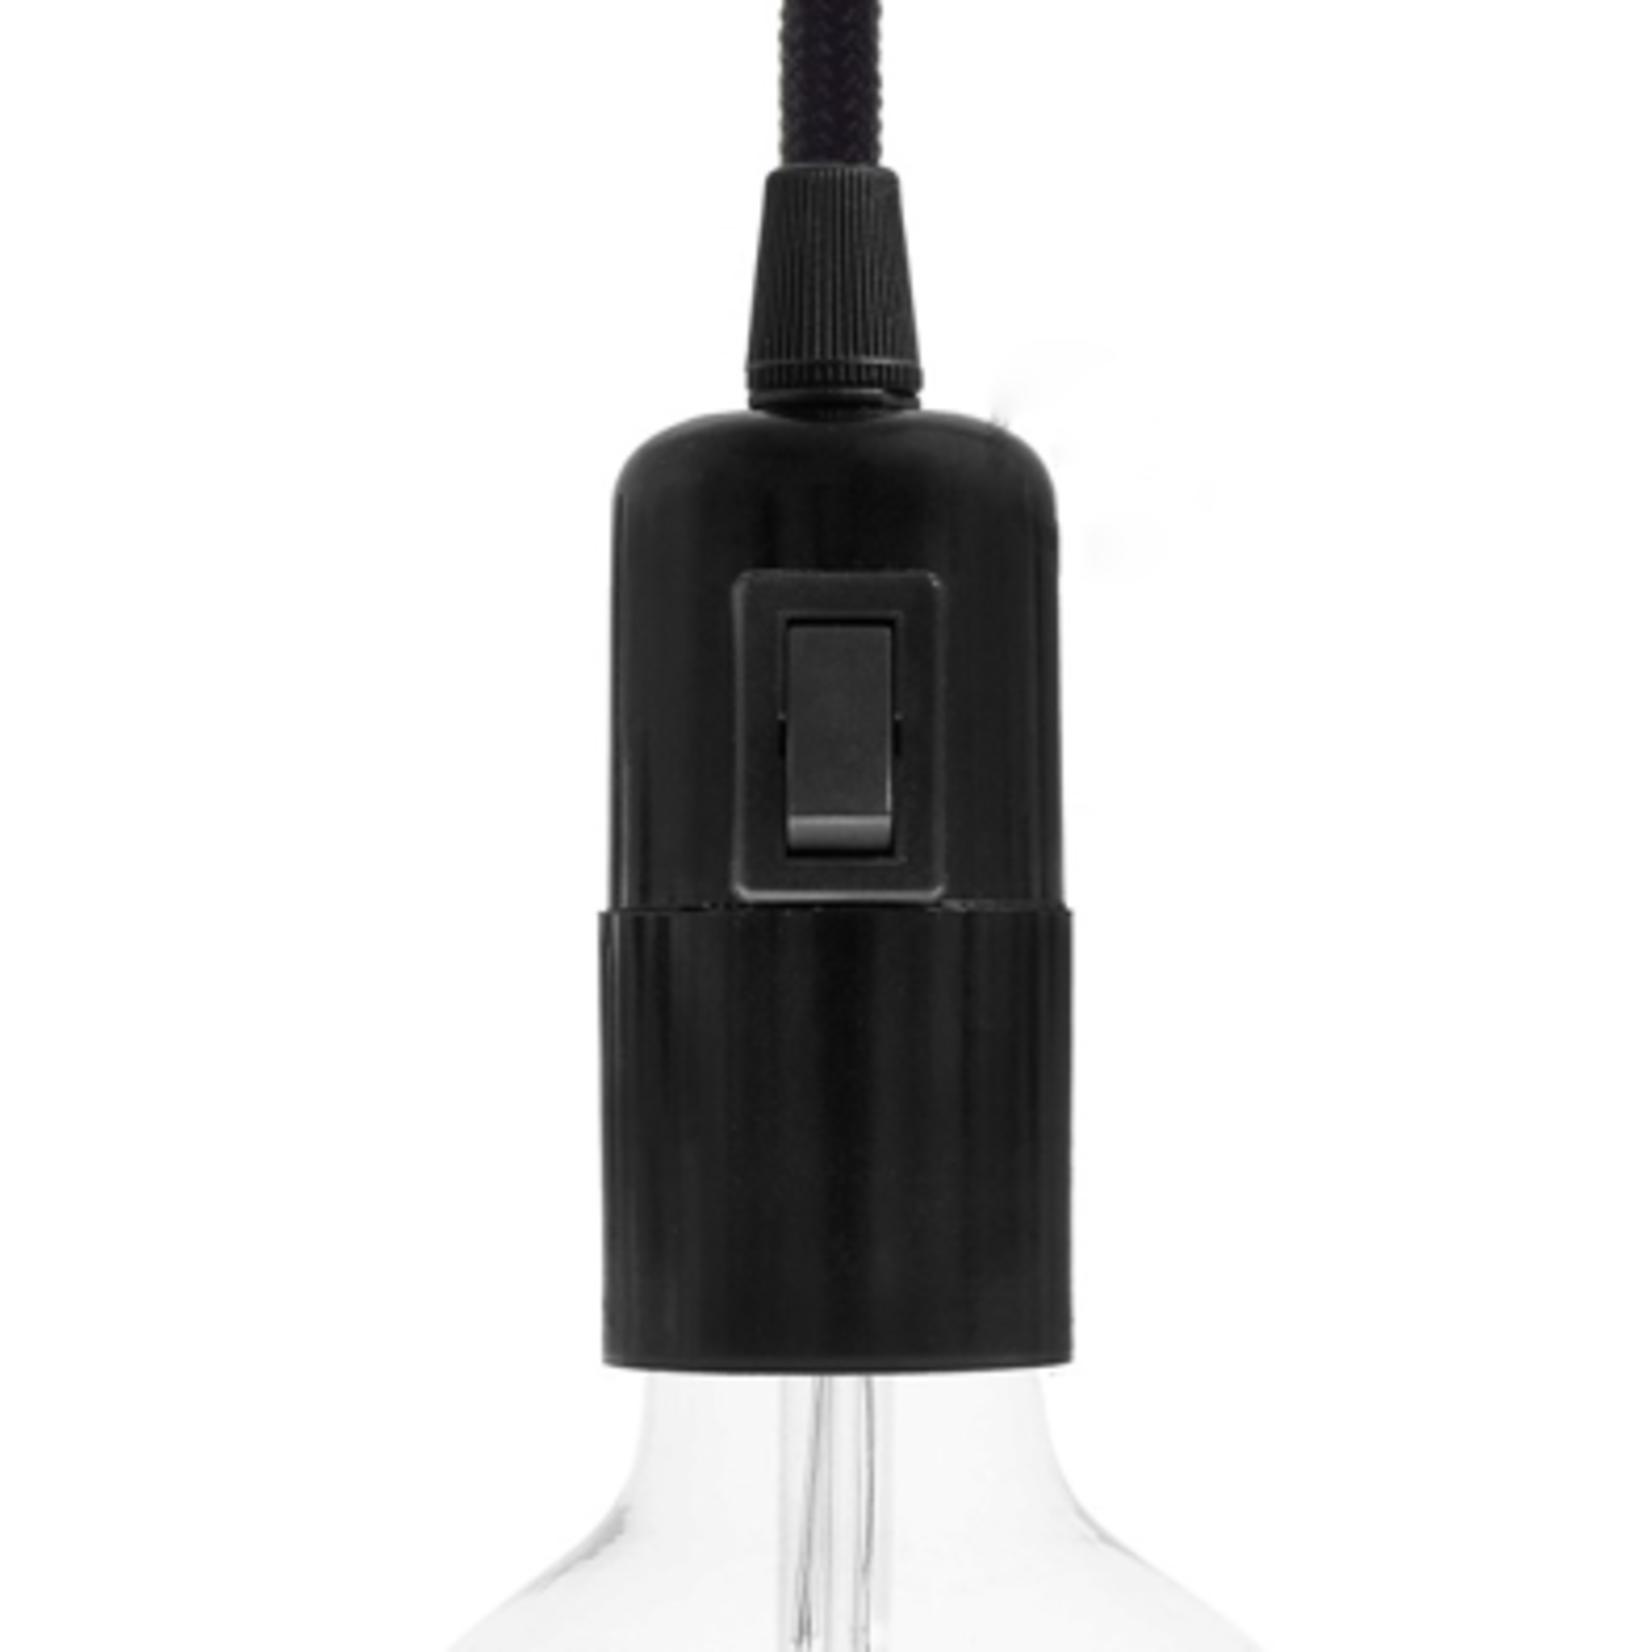 CCIT E27 lamp holder with switch in black bakelite